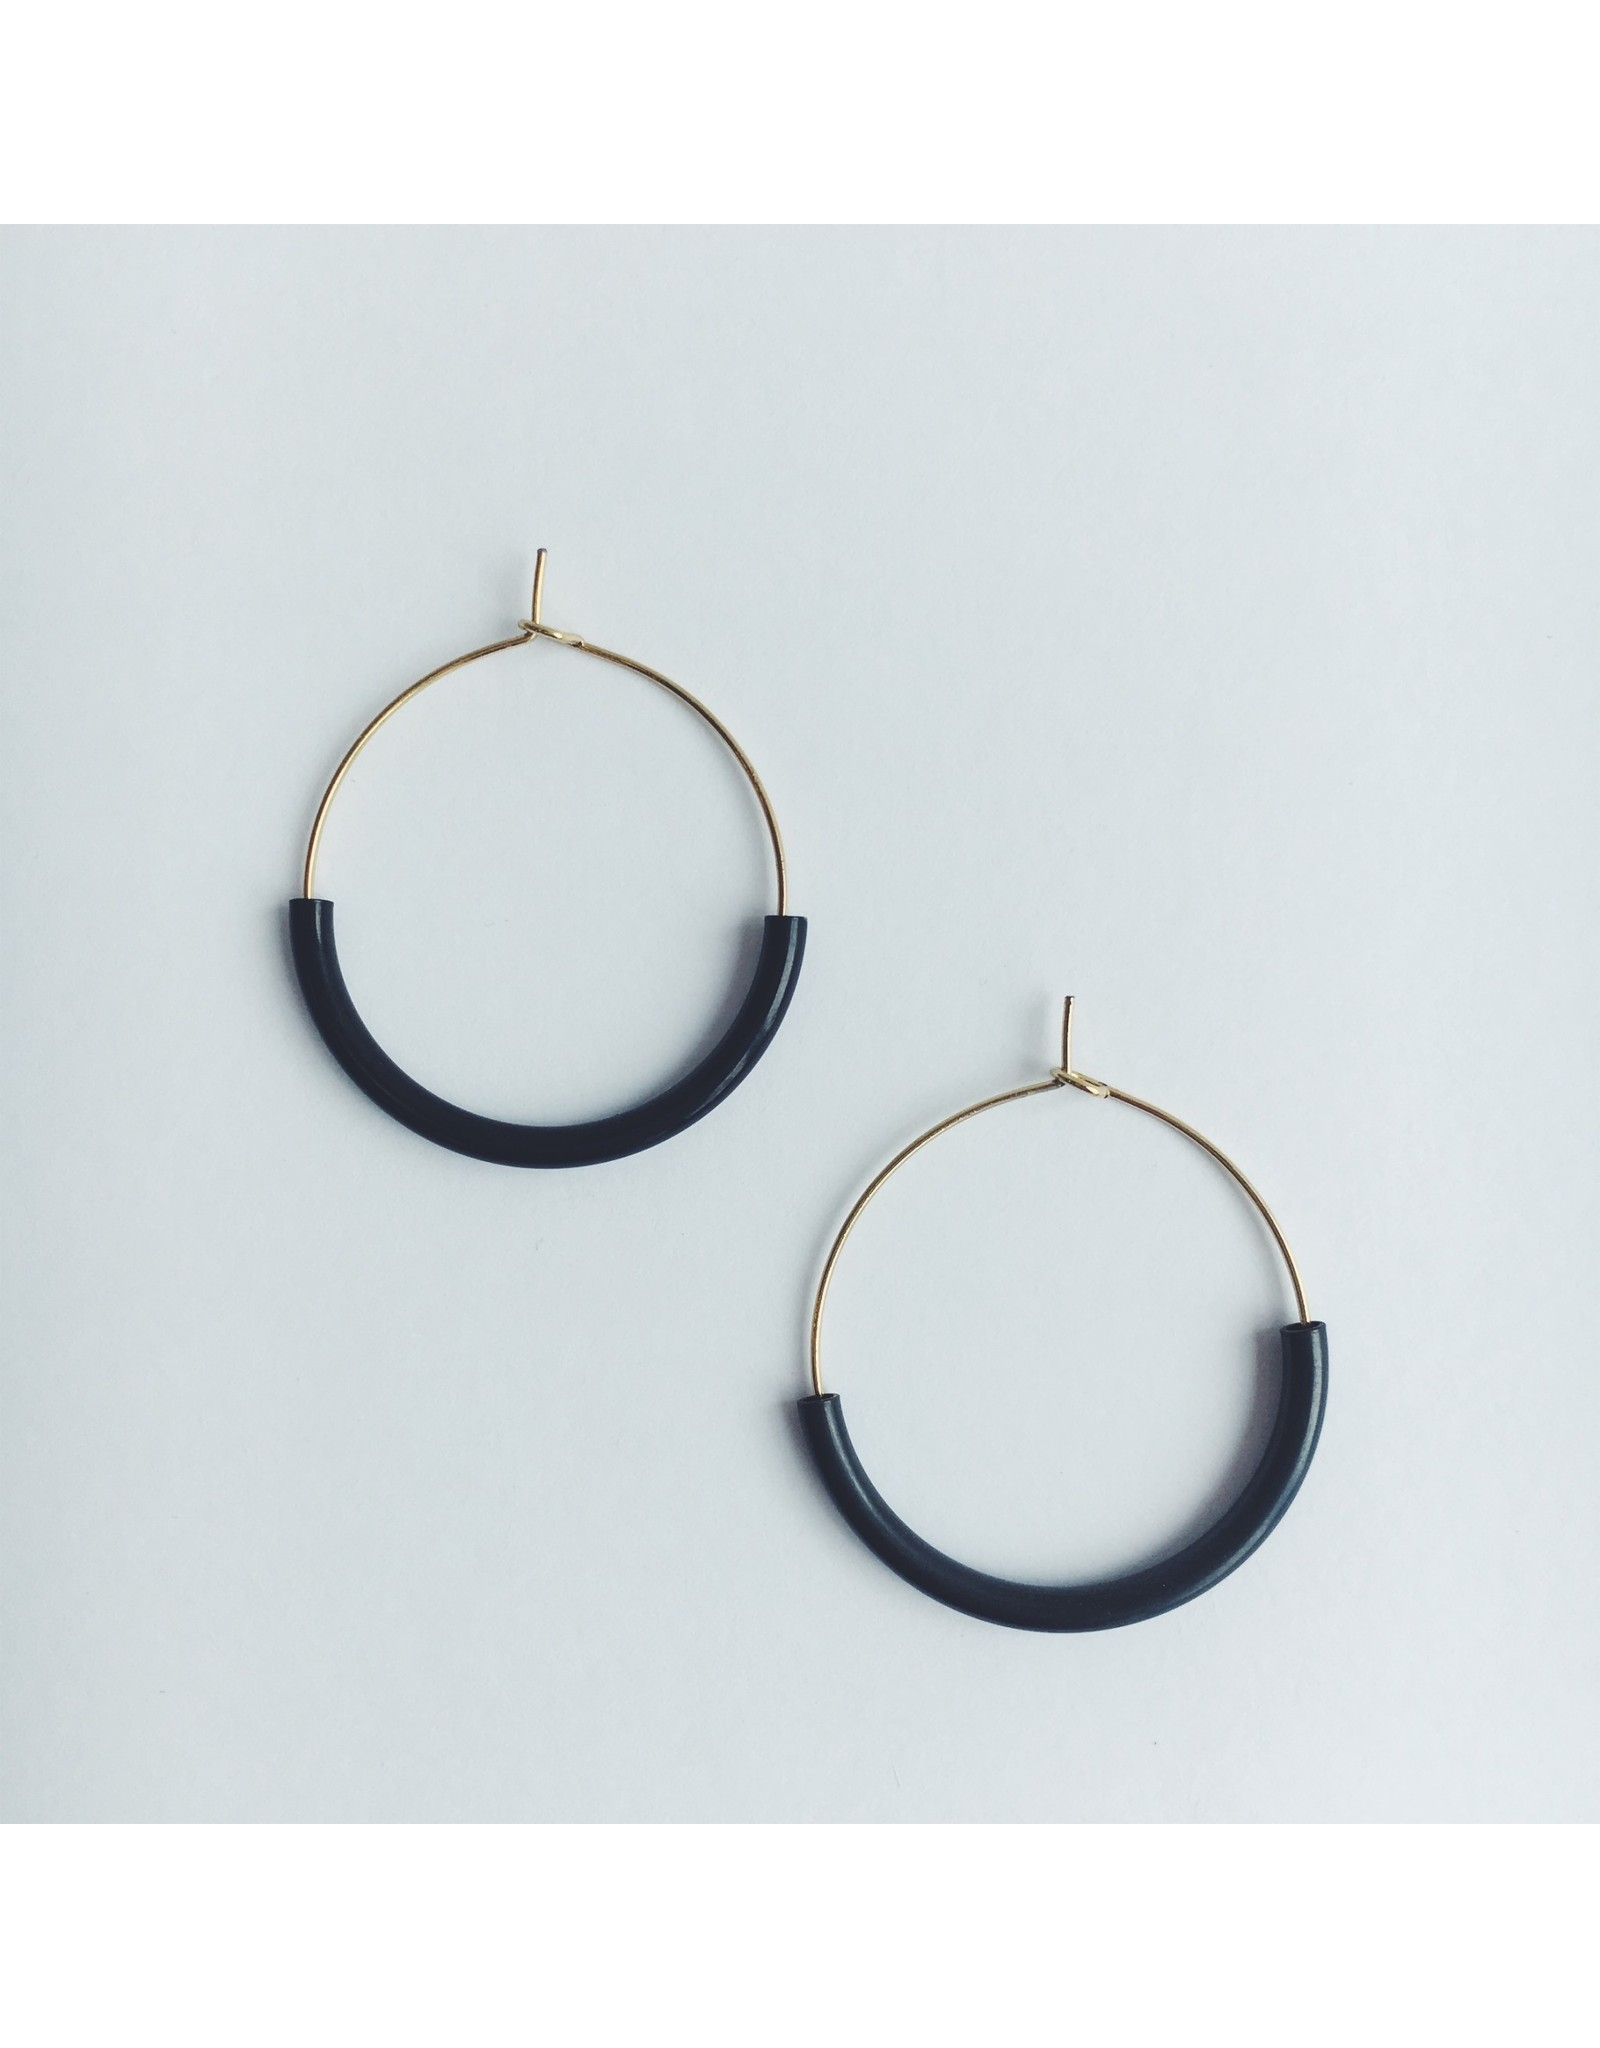 Brass & Black Hoop Earrings